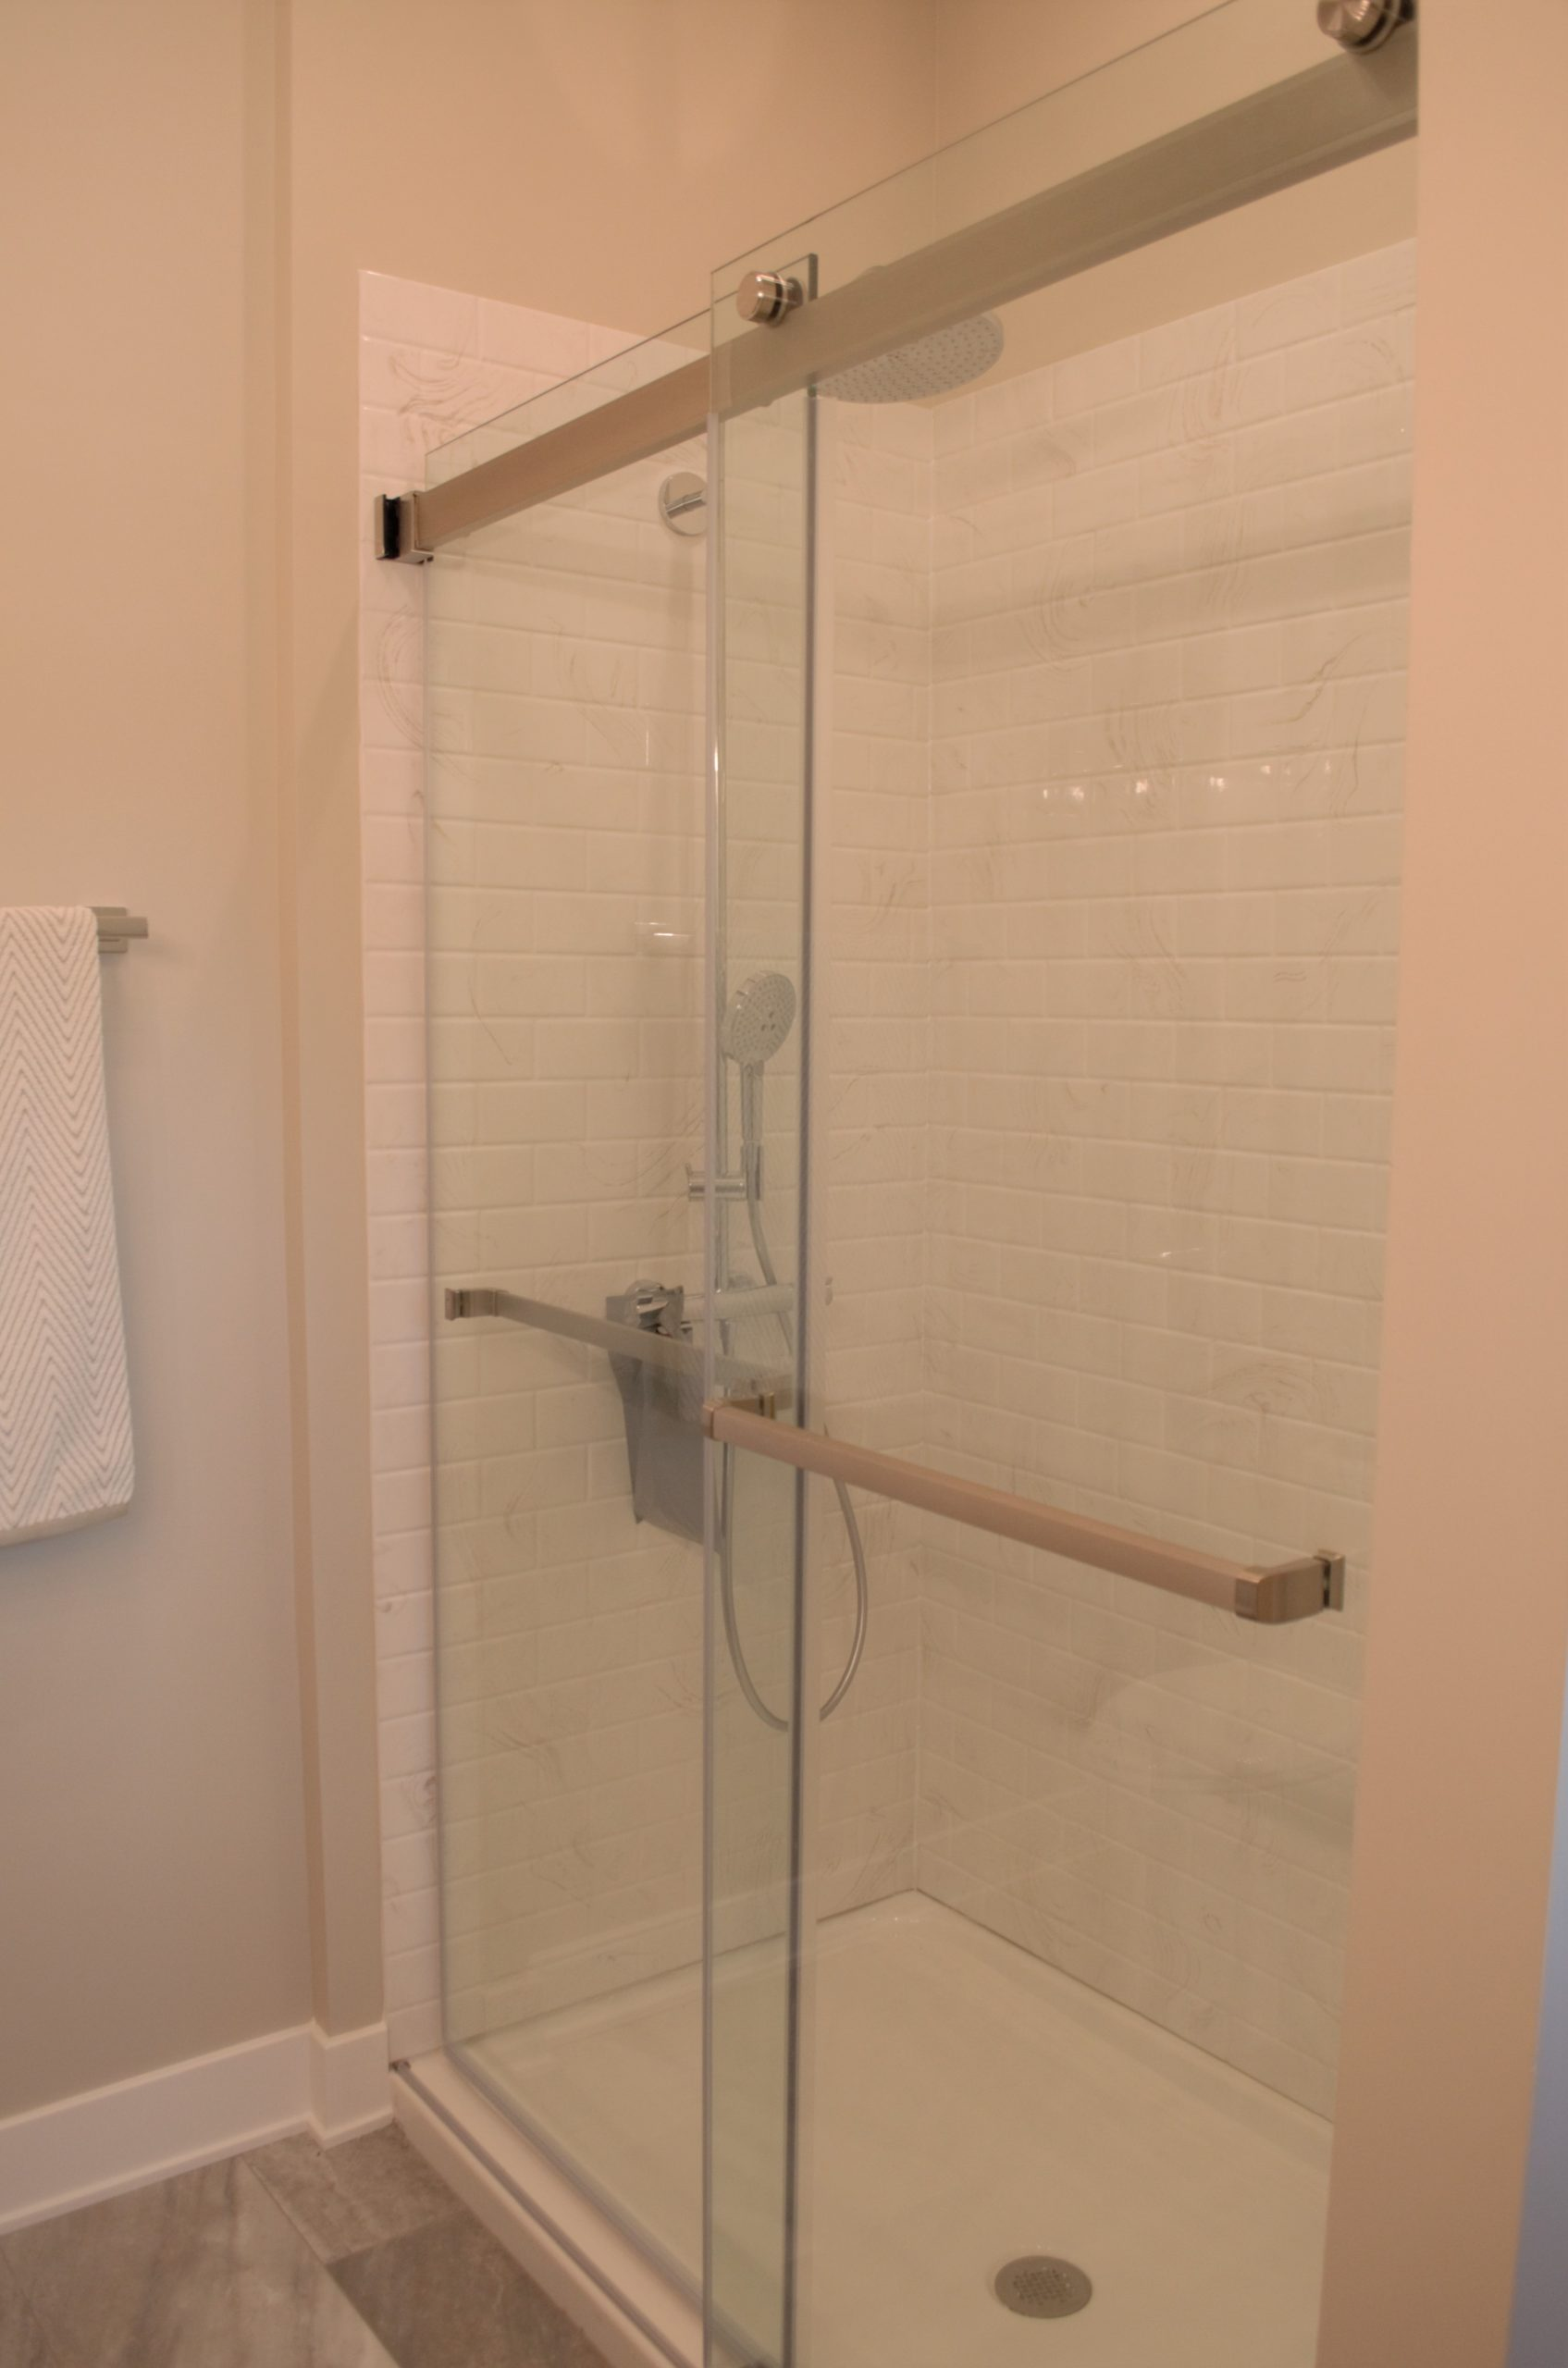 SPS shower